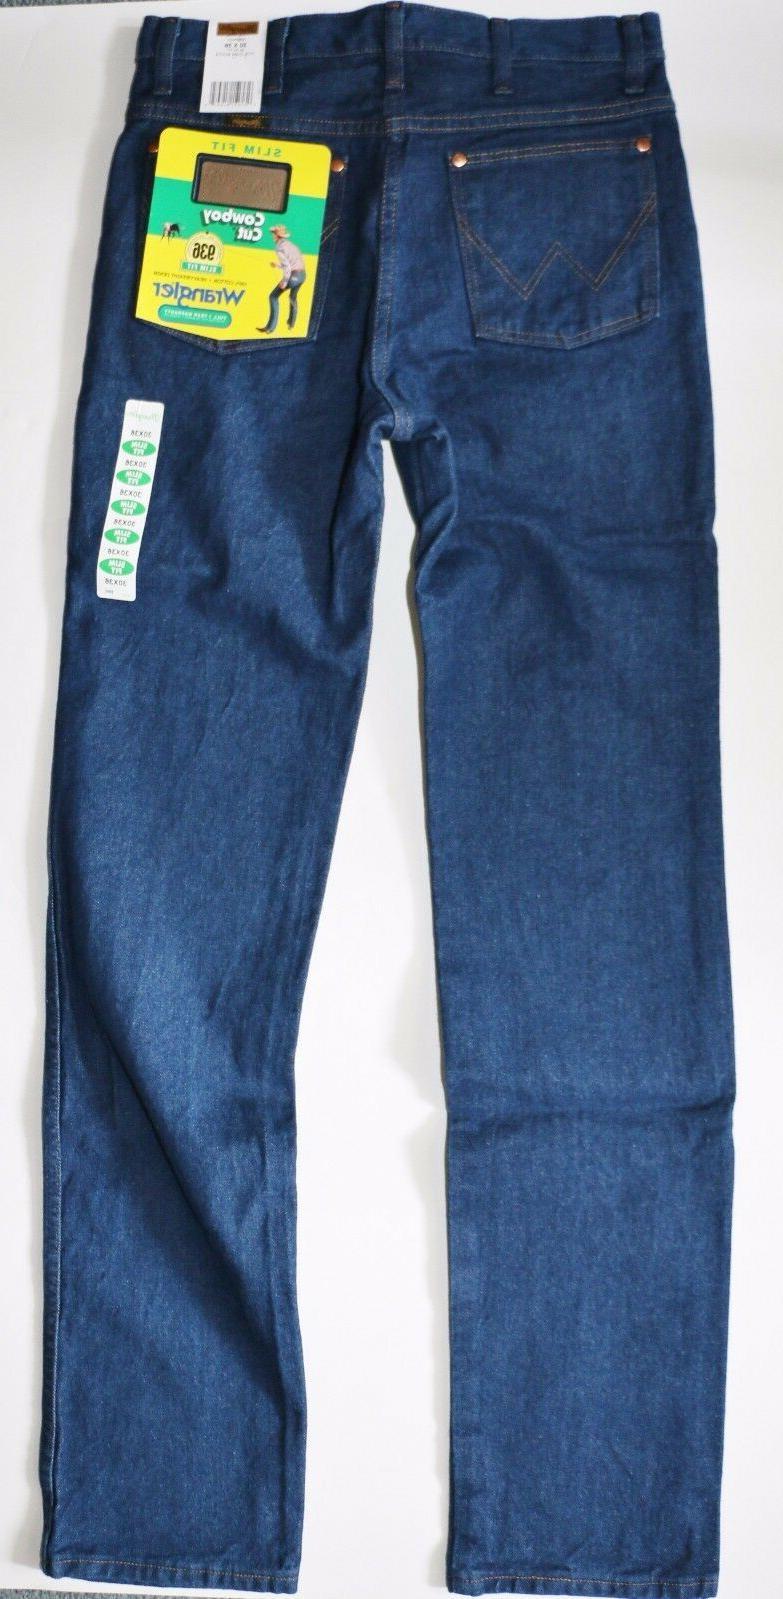 New Wrangler Cut Slim Fit Jeans Men's Sizes Prewashed Denim